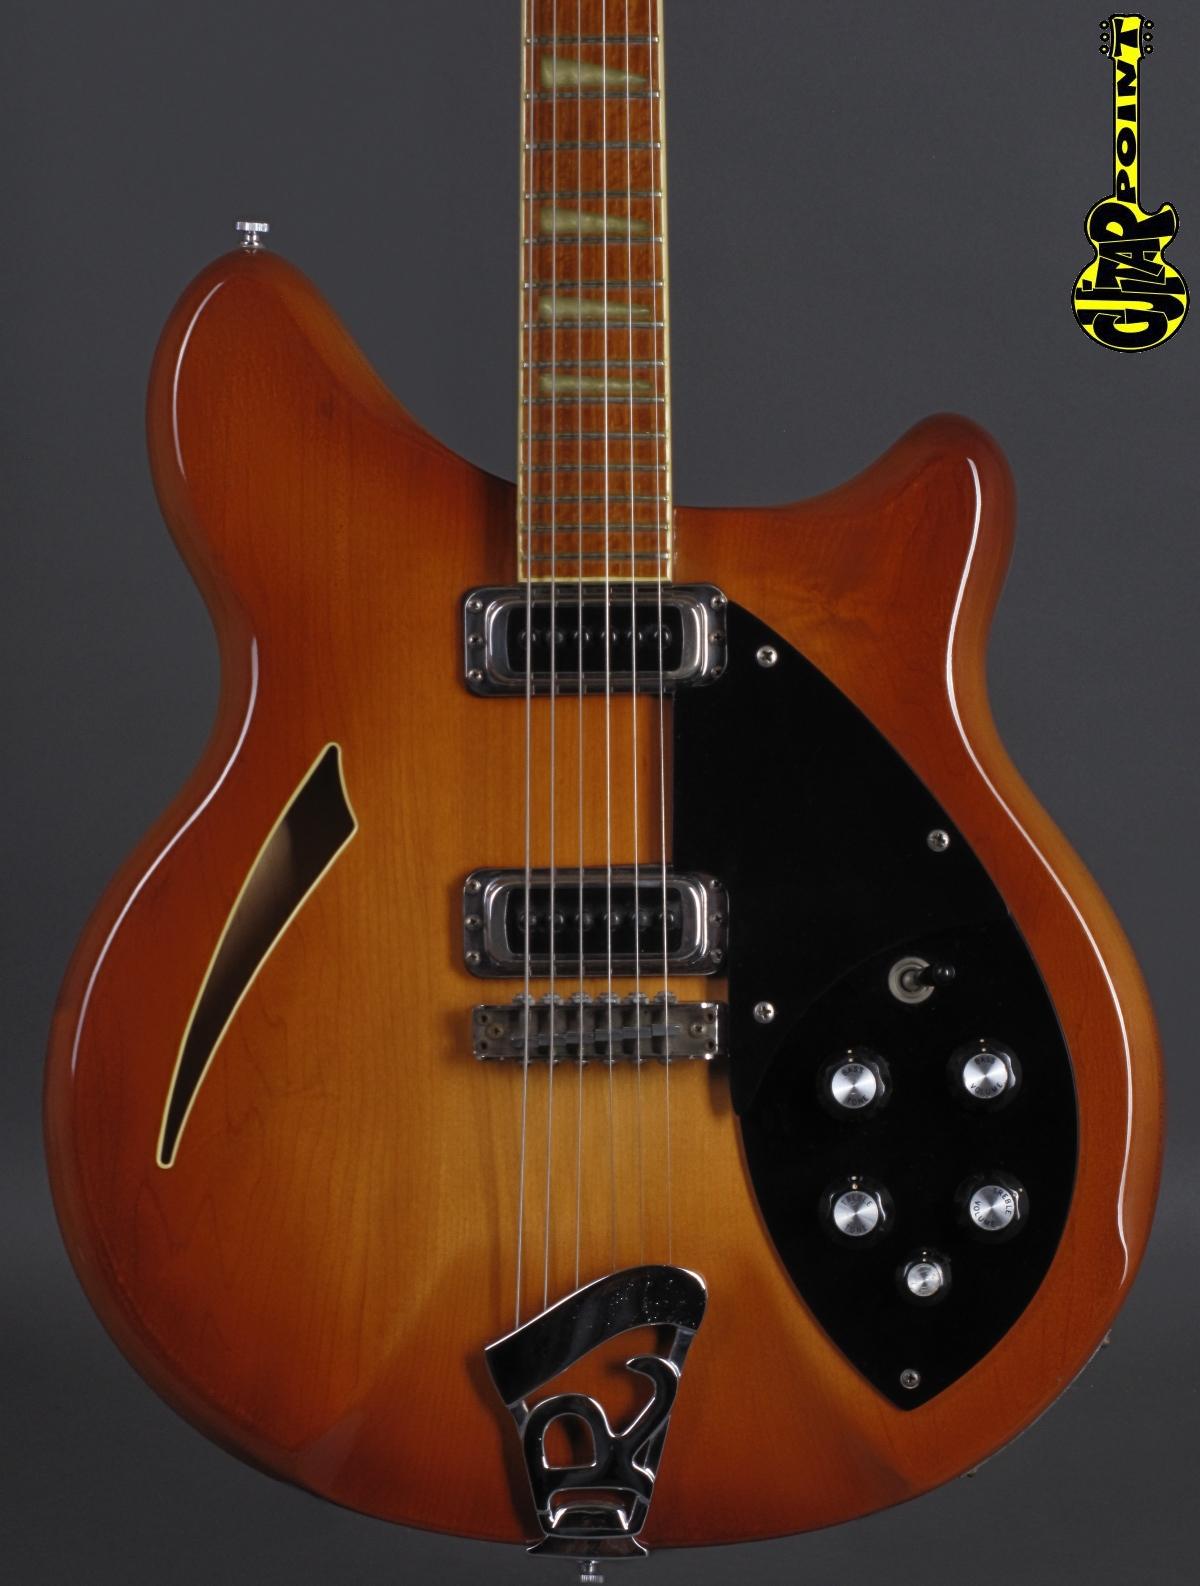 1979 Rickenbacker 360 - Autumnglo